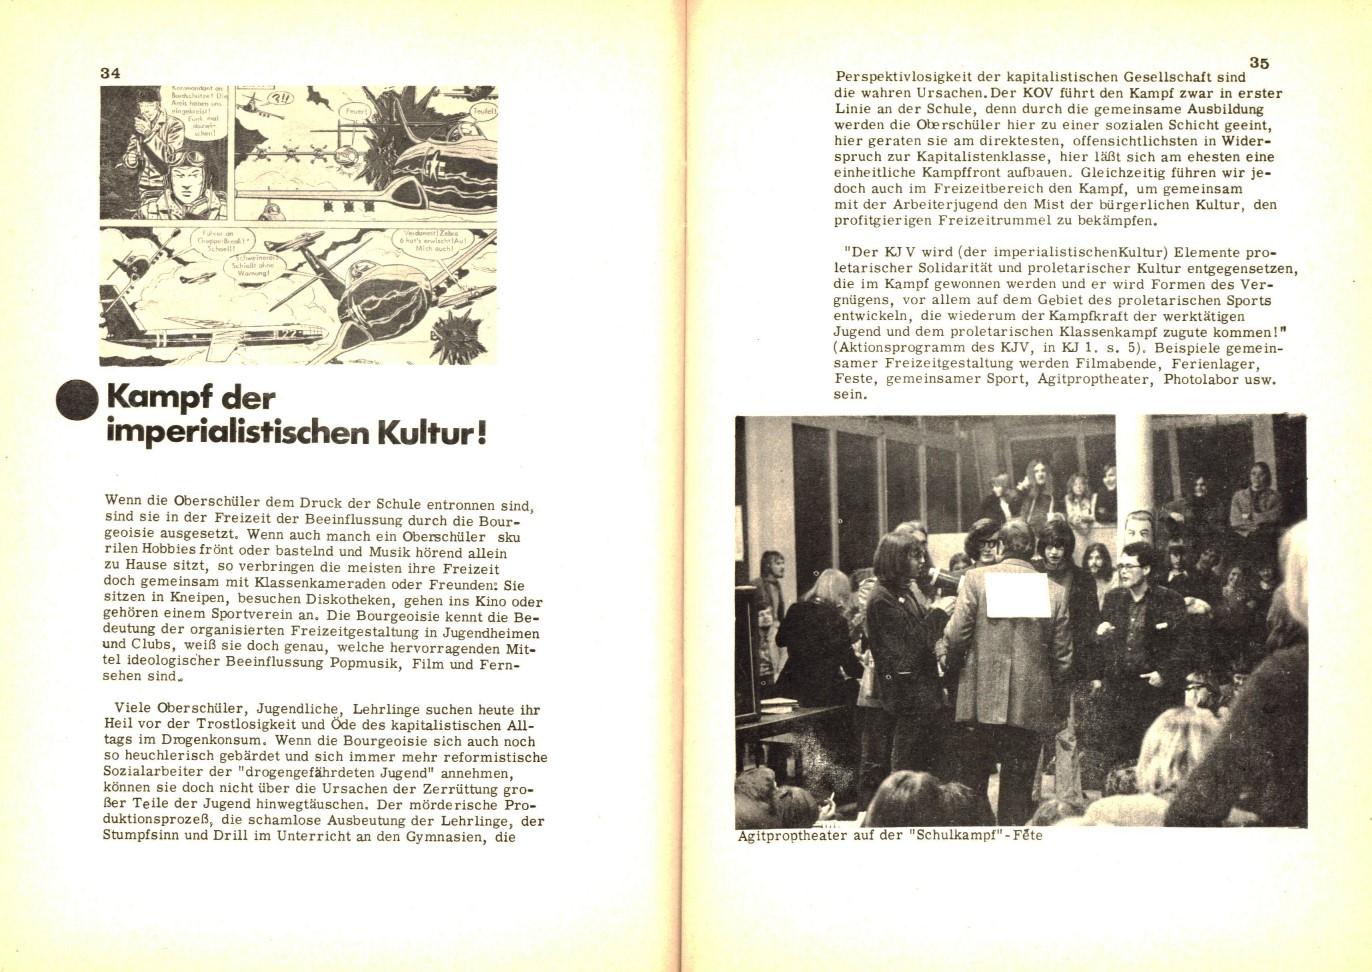 KOV_1973_Aktionsprogramm_20